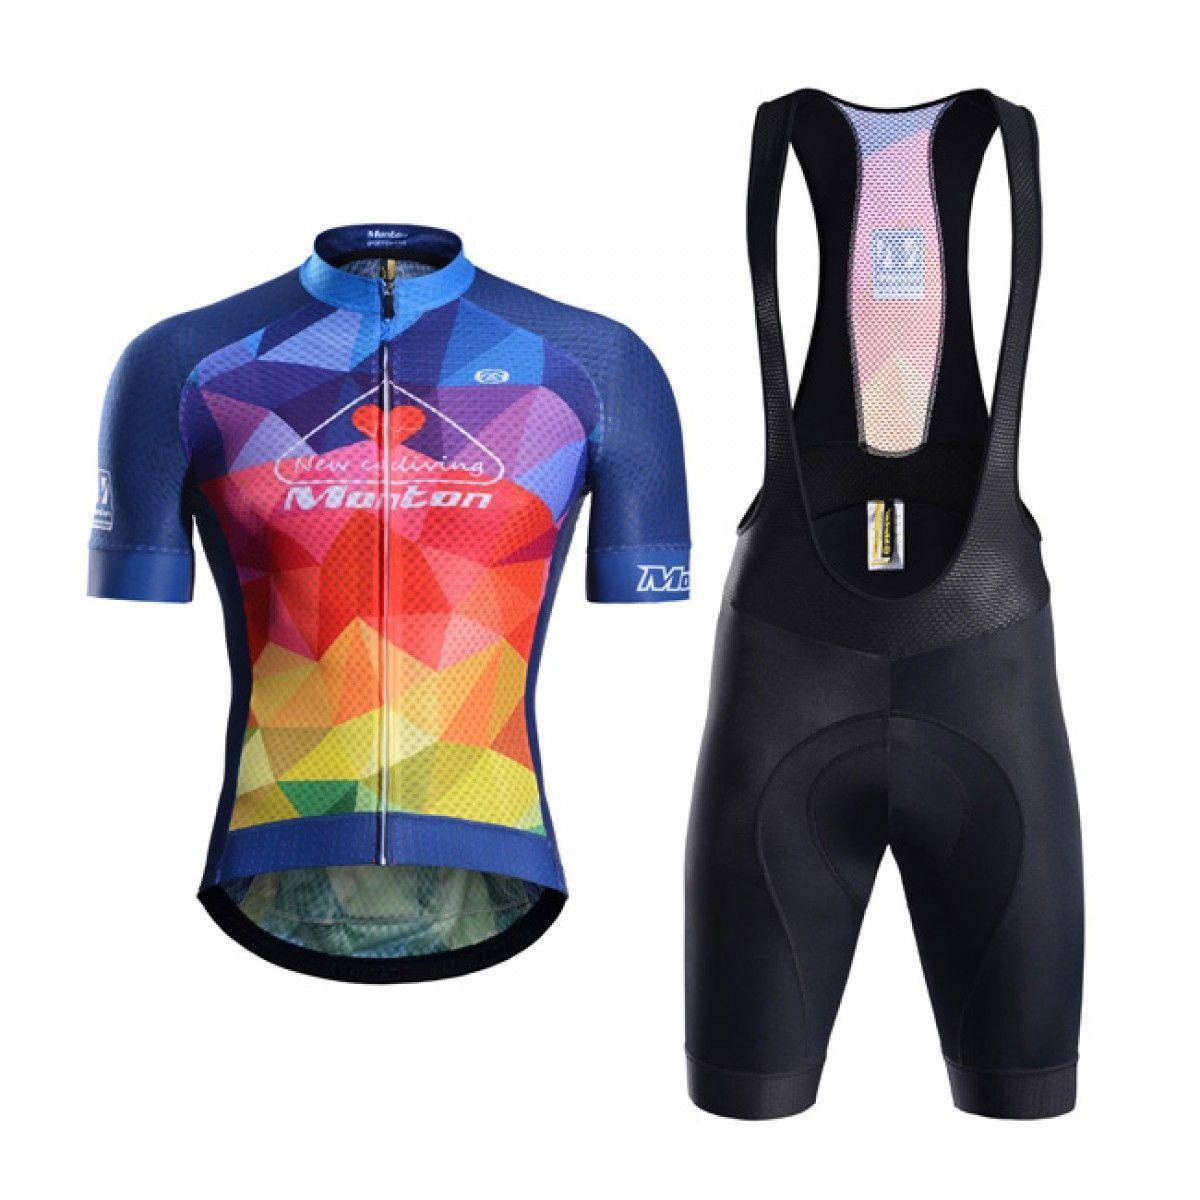 46f3cb544 2016 best cycling jersey bib shorts set